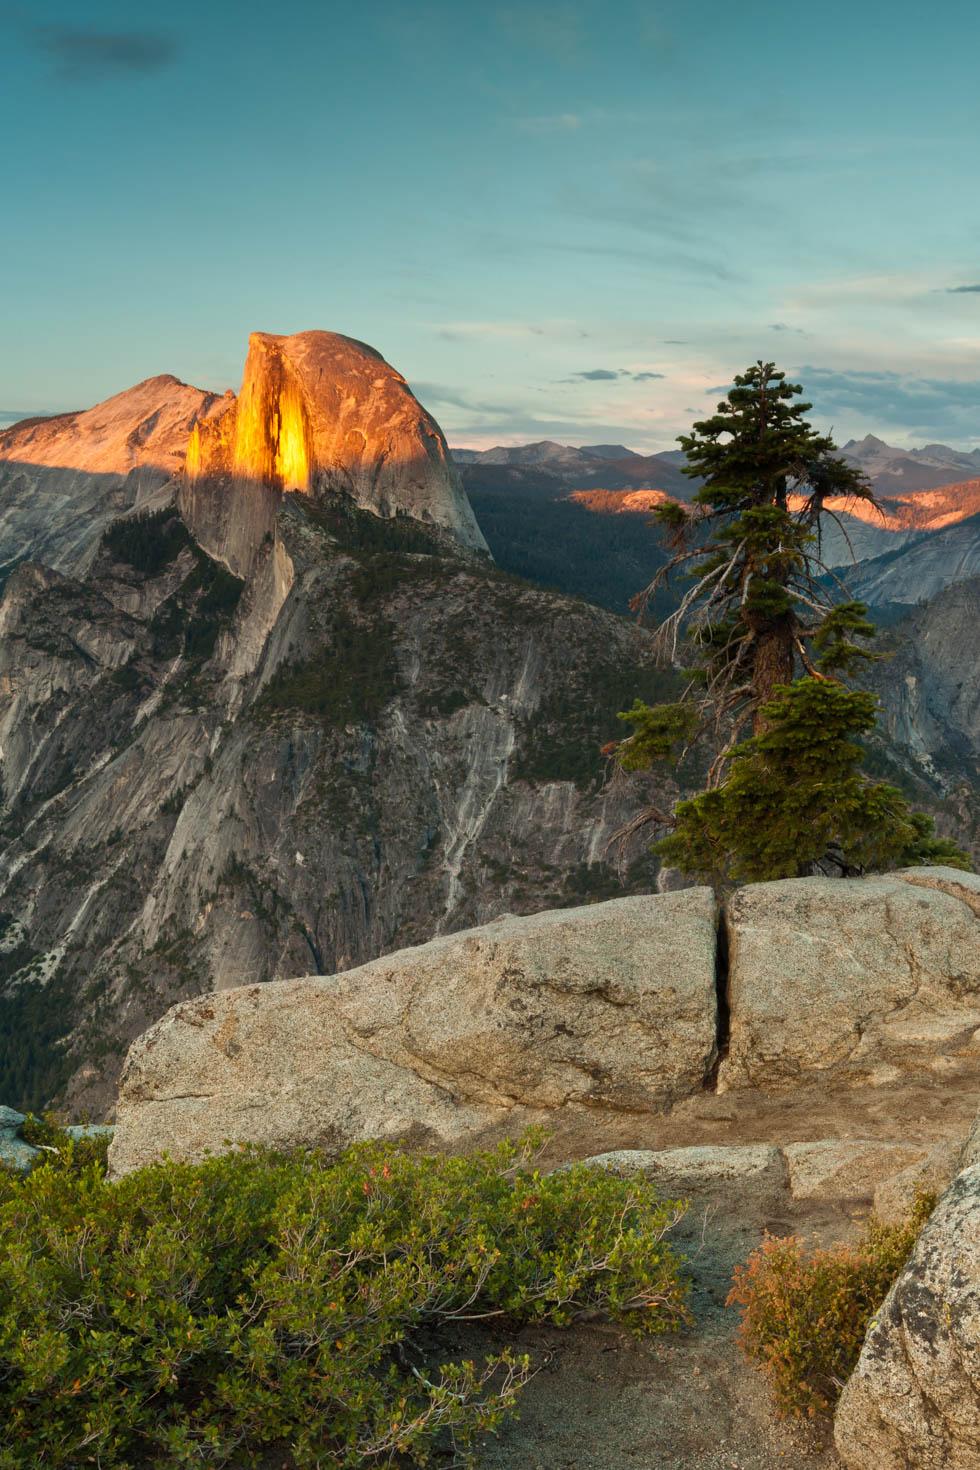 Sunset over Half Dome, Glacier Point, Yosemite National Park, California